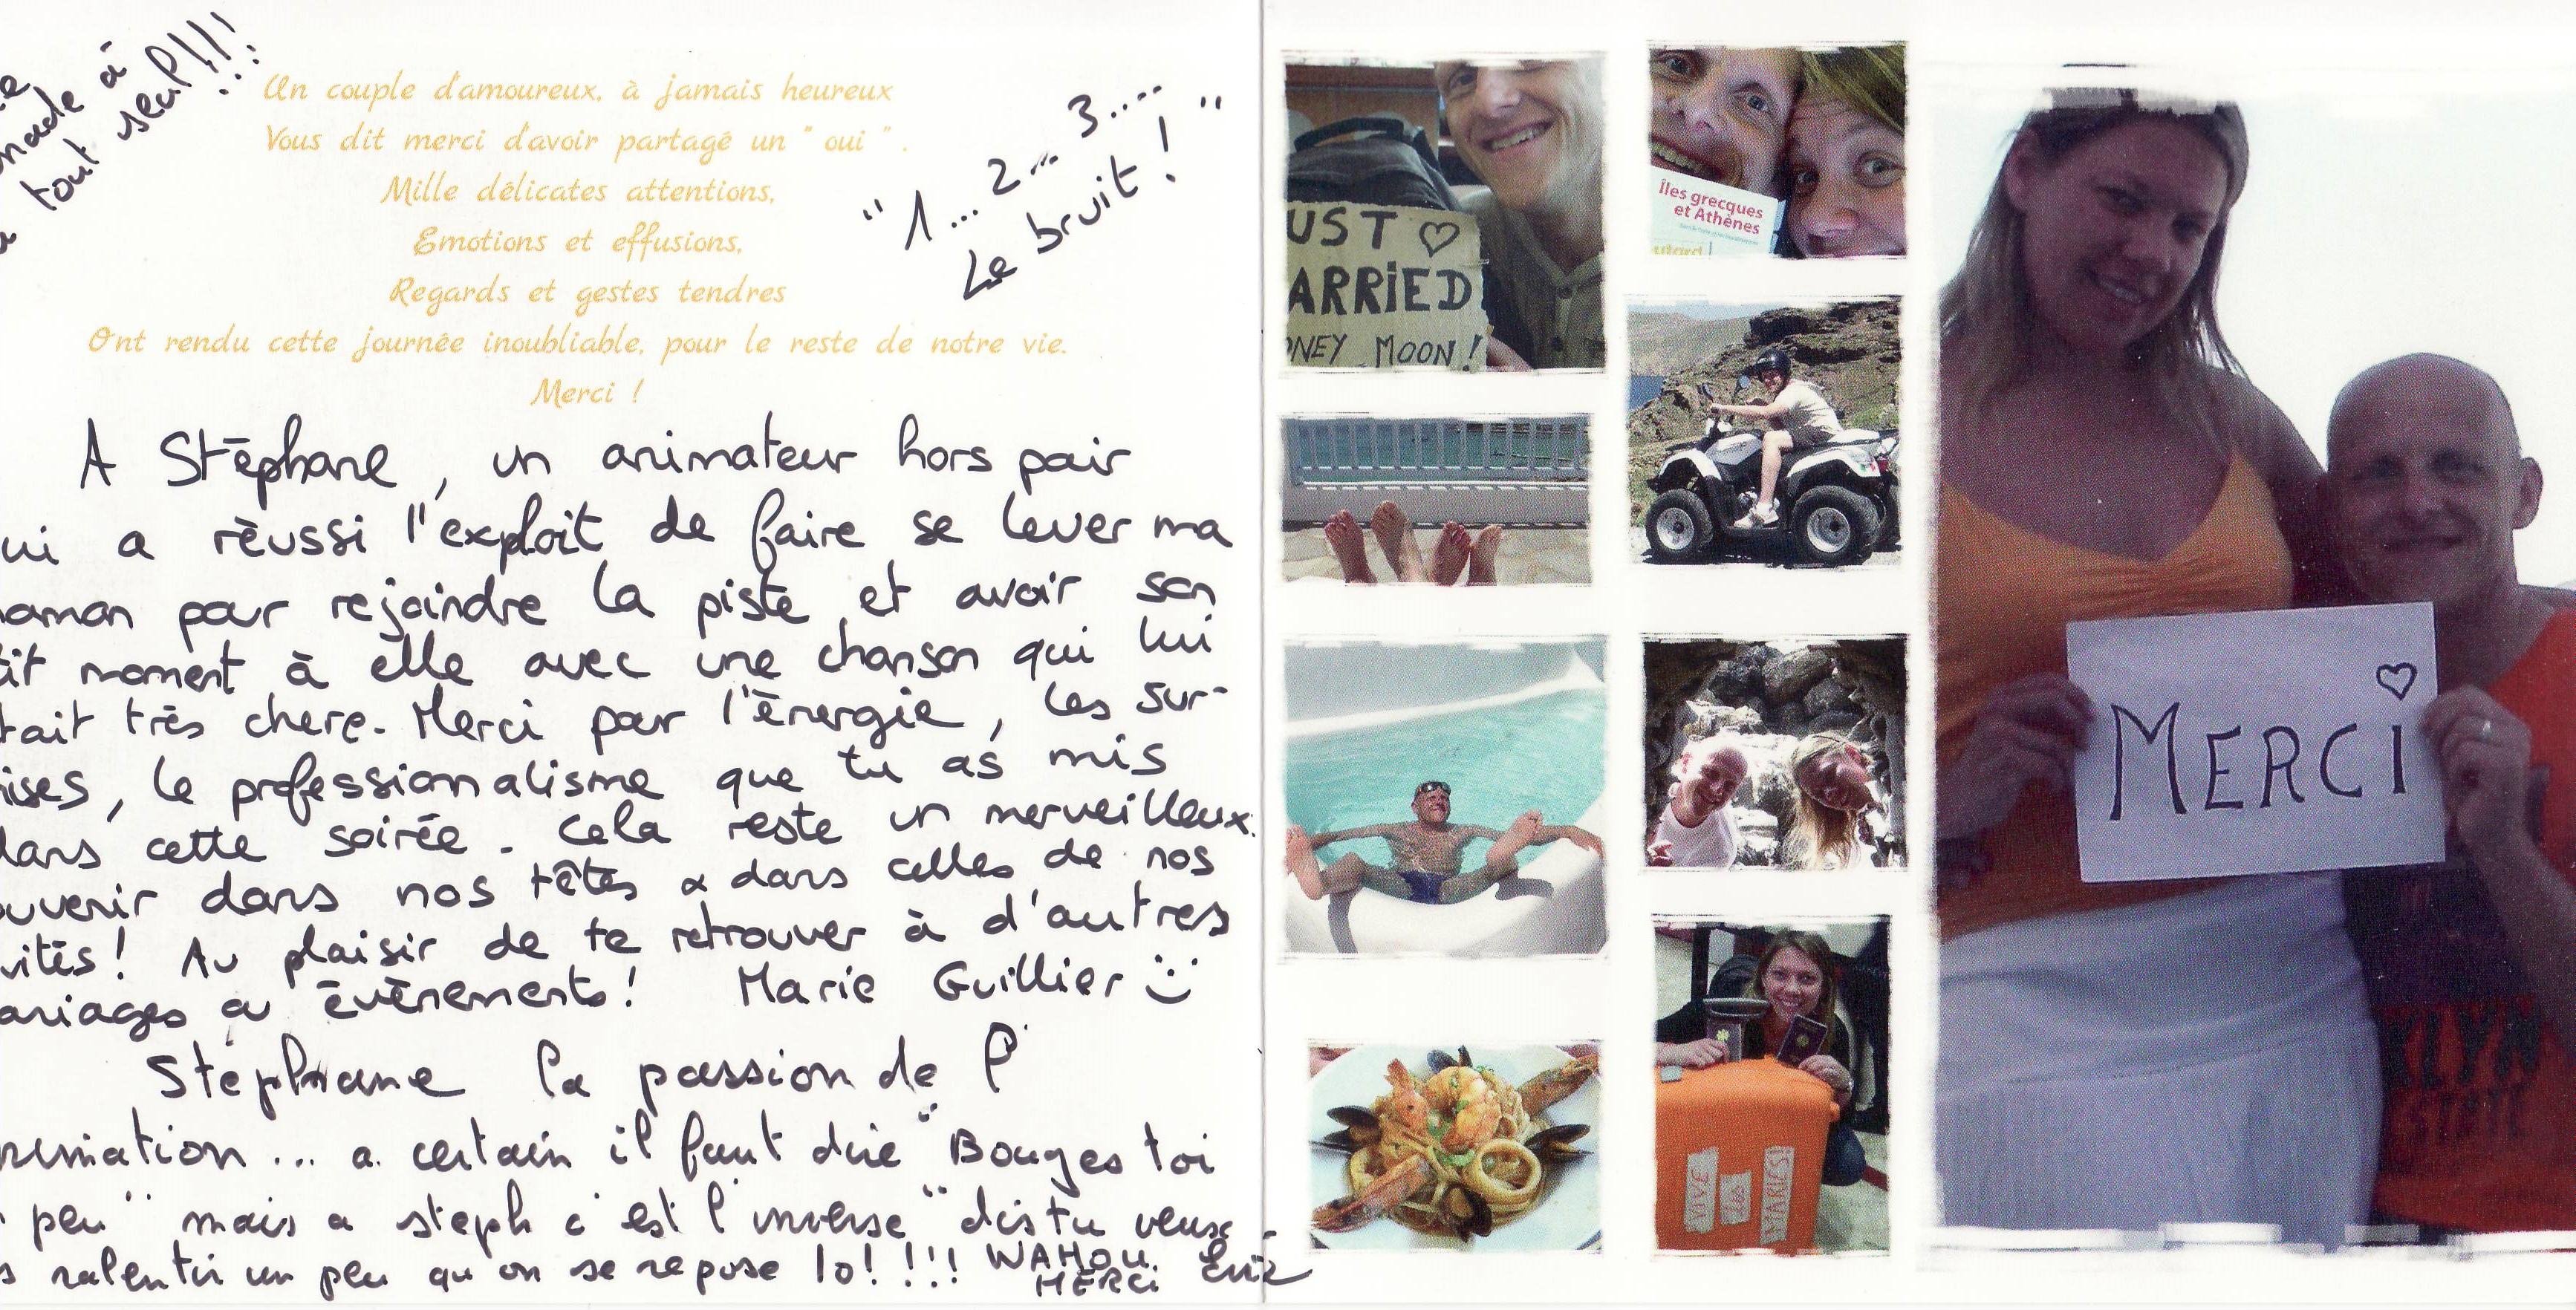 Mariage_GUILLIER_Eric_&_Marie_(Vétraz-Monthoux)_(09-05-2015)_2.JPG